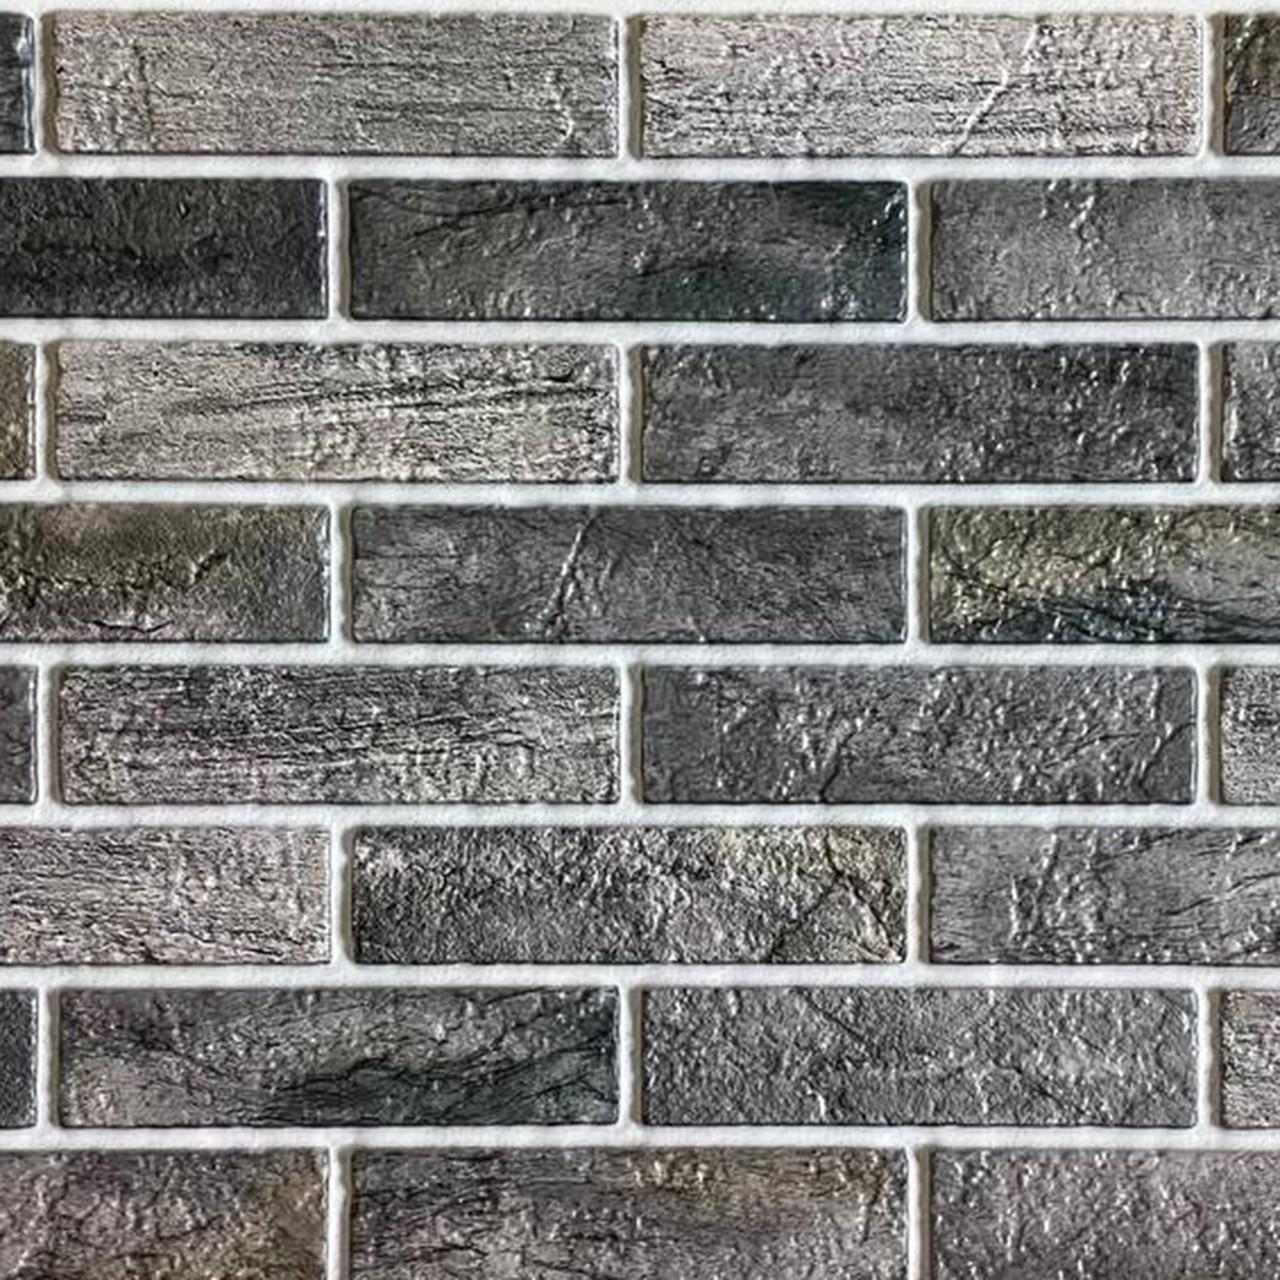 Стеновая декоративная пластиковая панель ПВХ  - КИРПИЧ БИСМАРК Лофт (960х485) мм